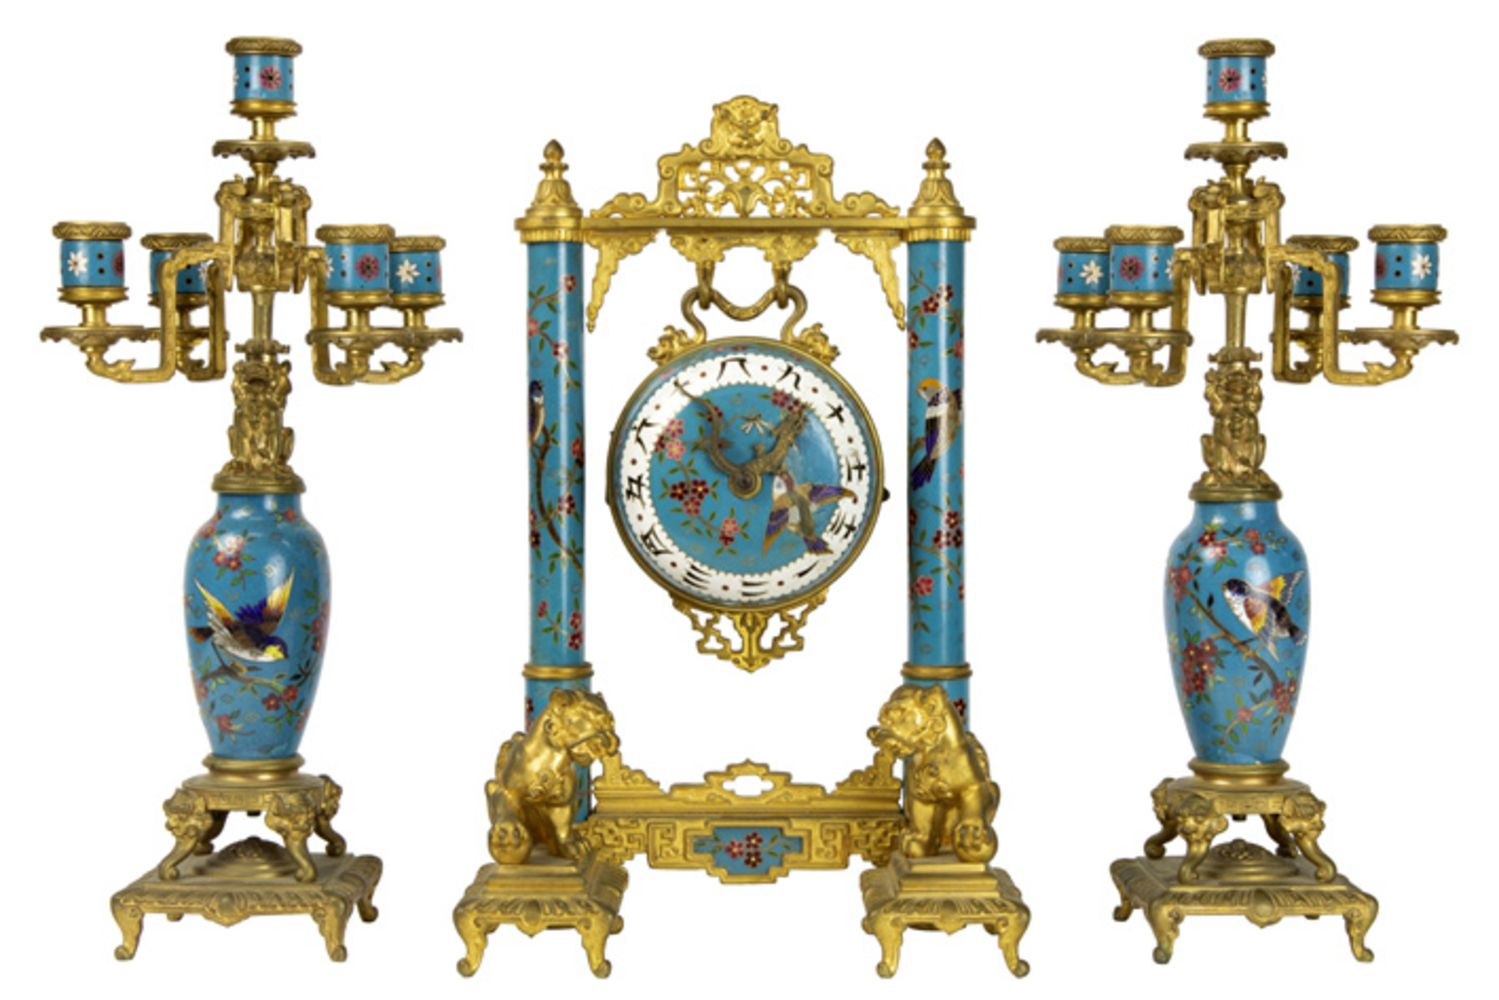 Classic Art and Antiques